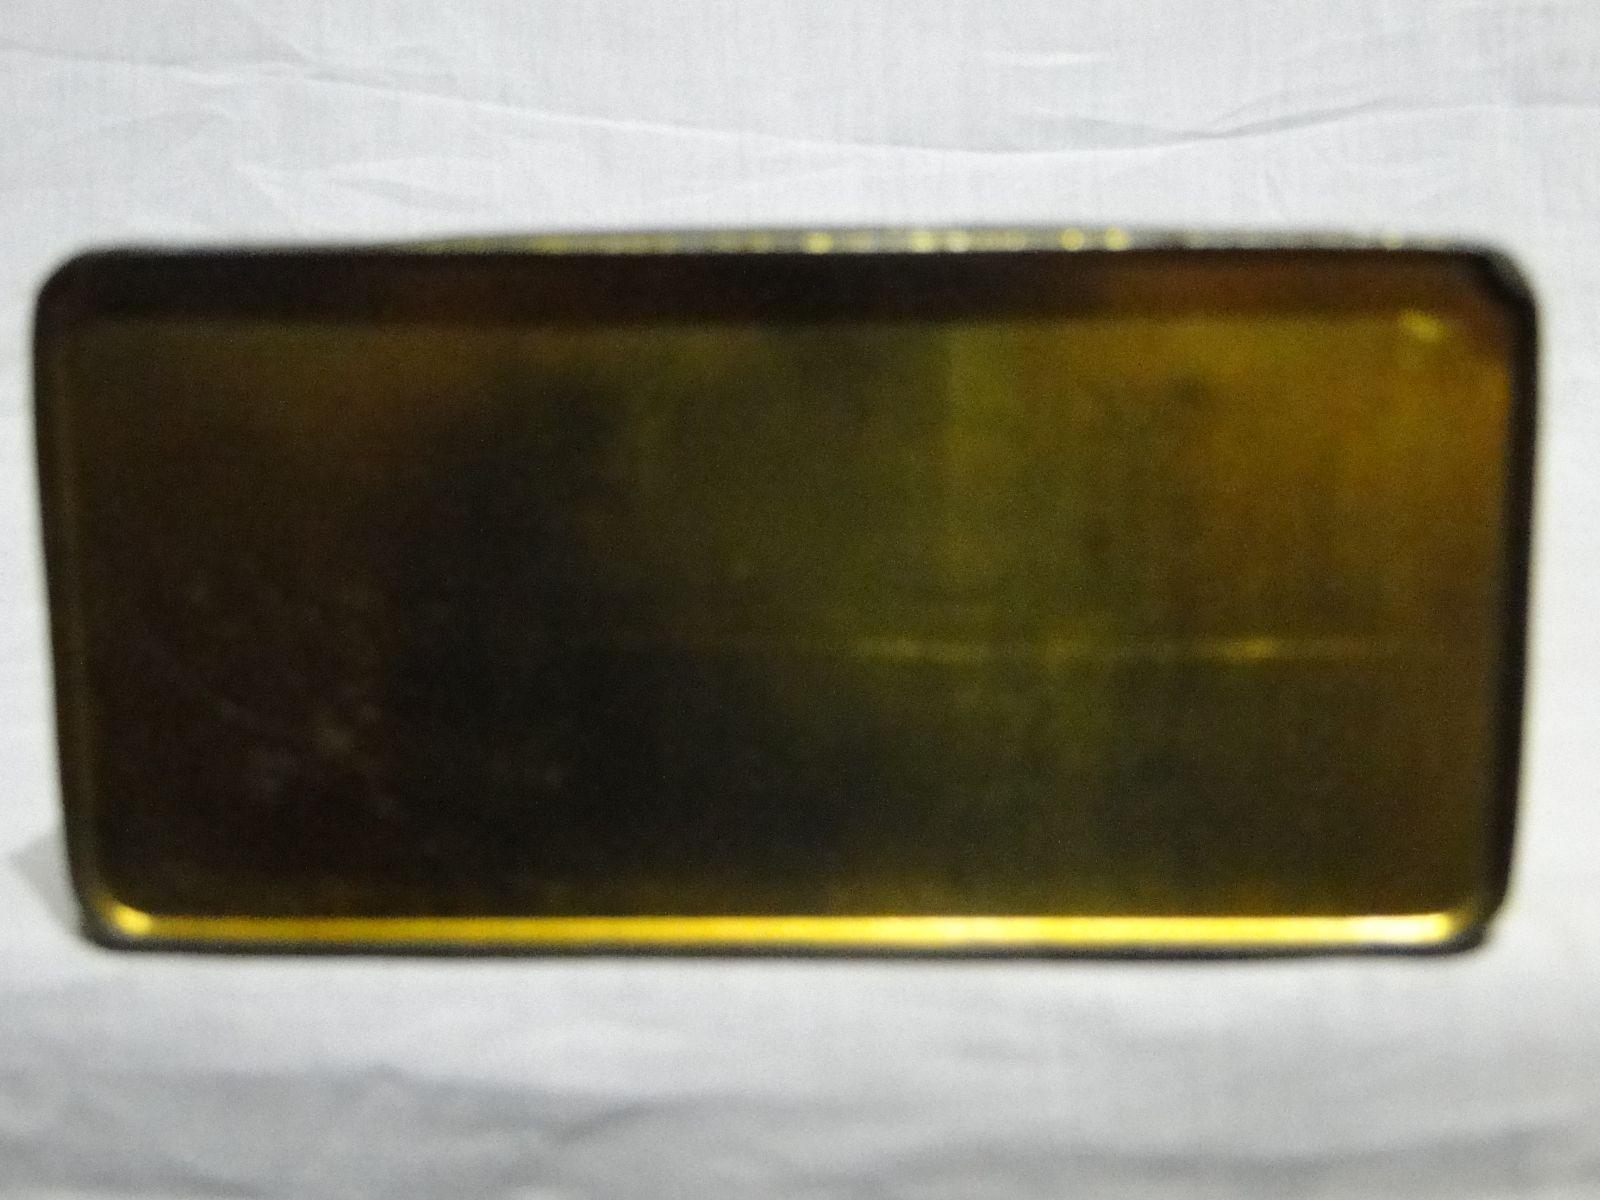 DSC01400.JPG (1600�1200)